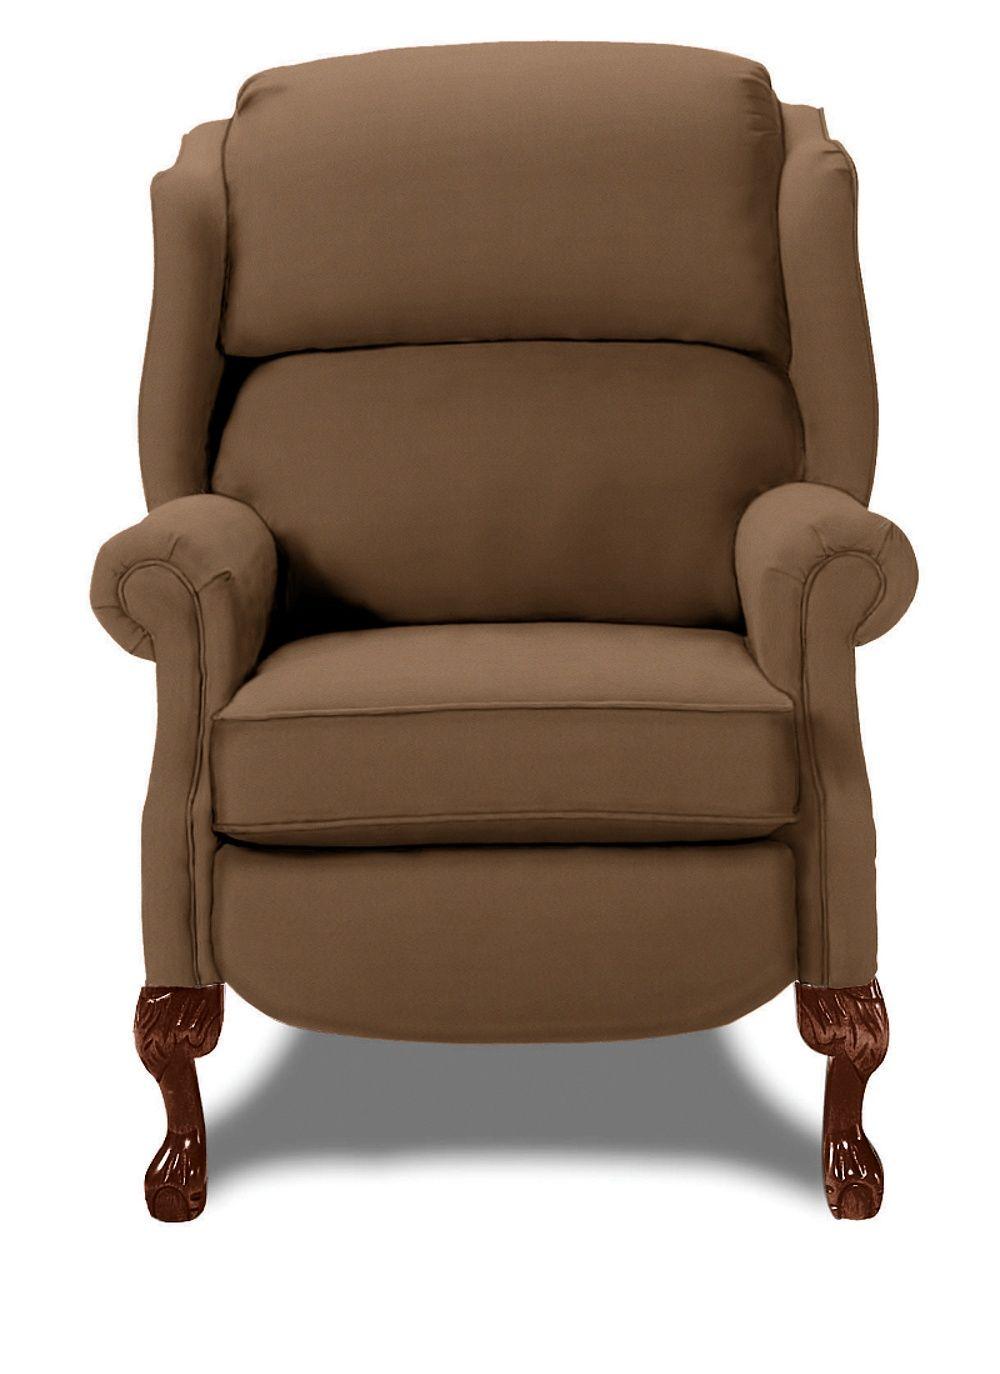 richfield high leg recliner around 1500cdn la z boy life in the living room recliner parks. Black Bedroom Furniture Sets. Home Design Ideas